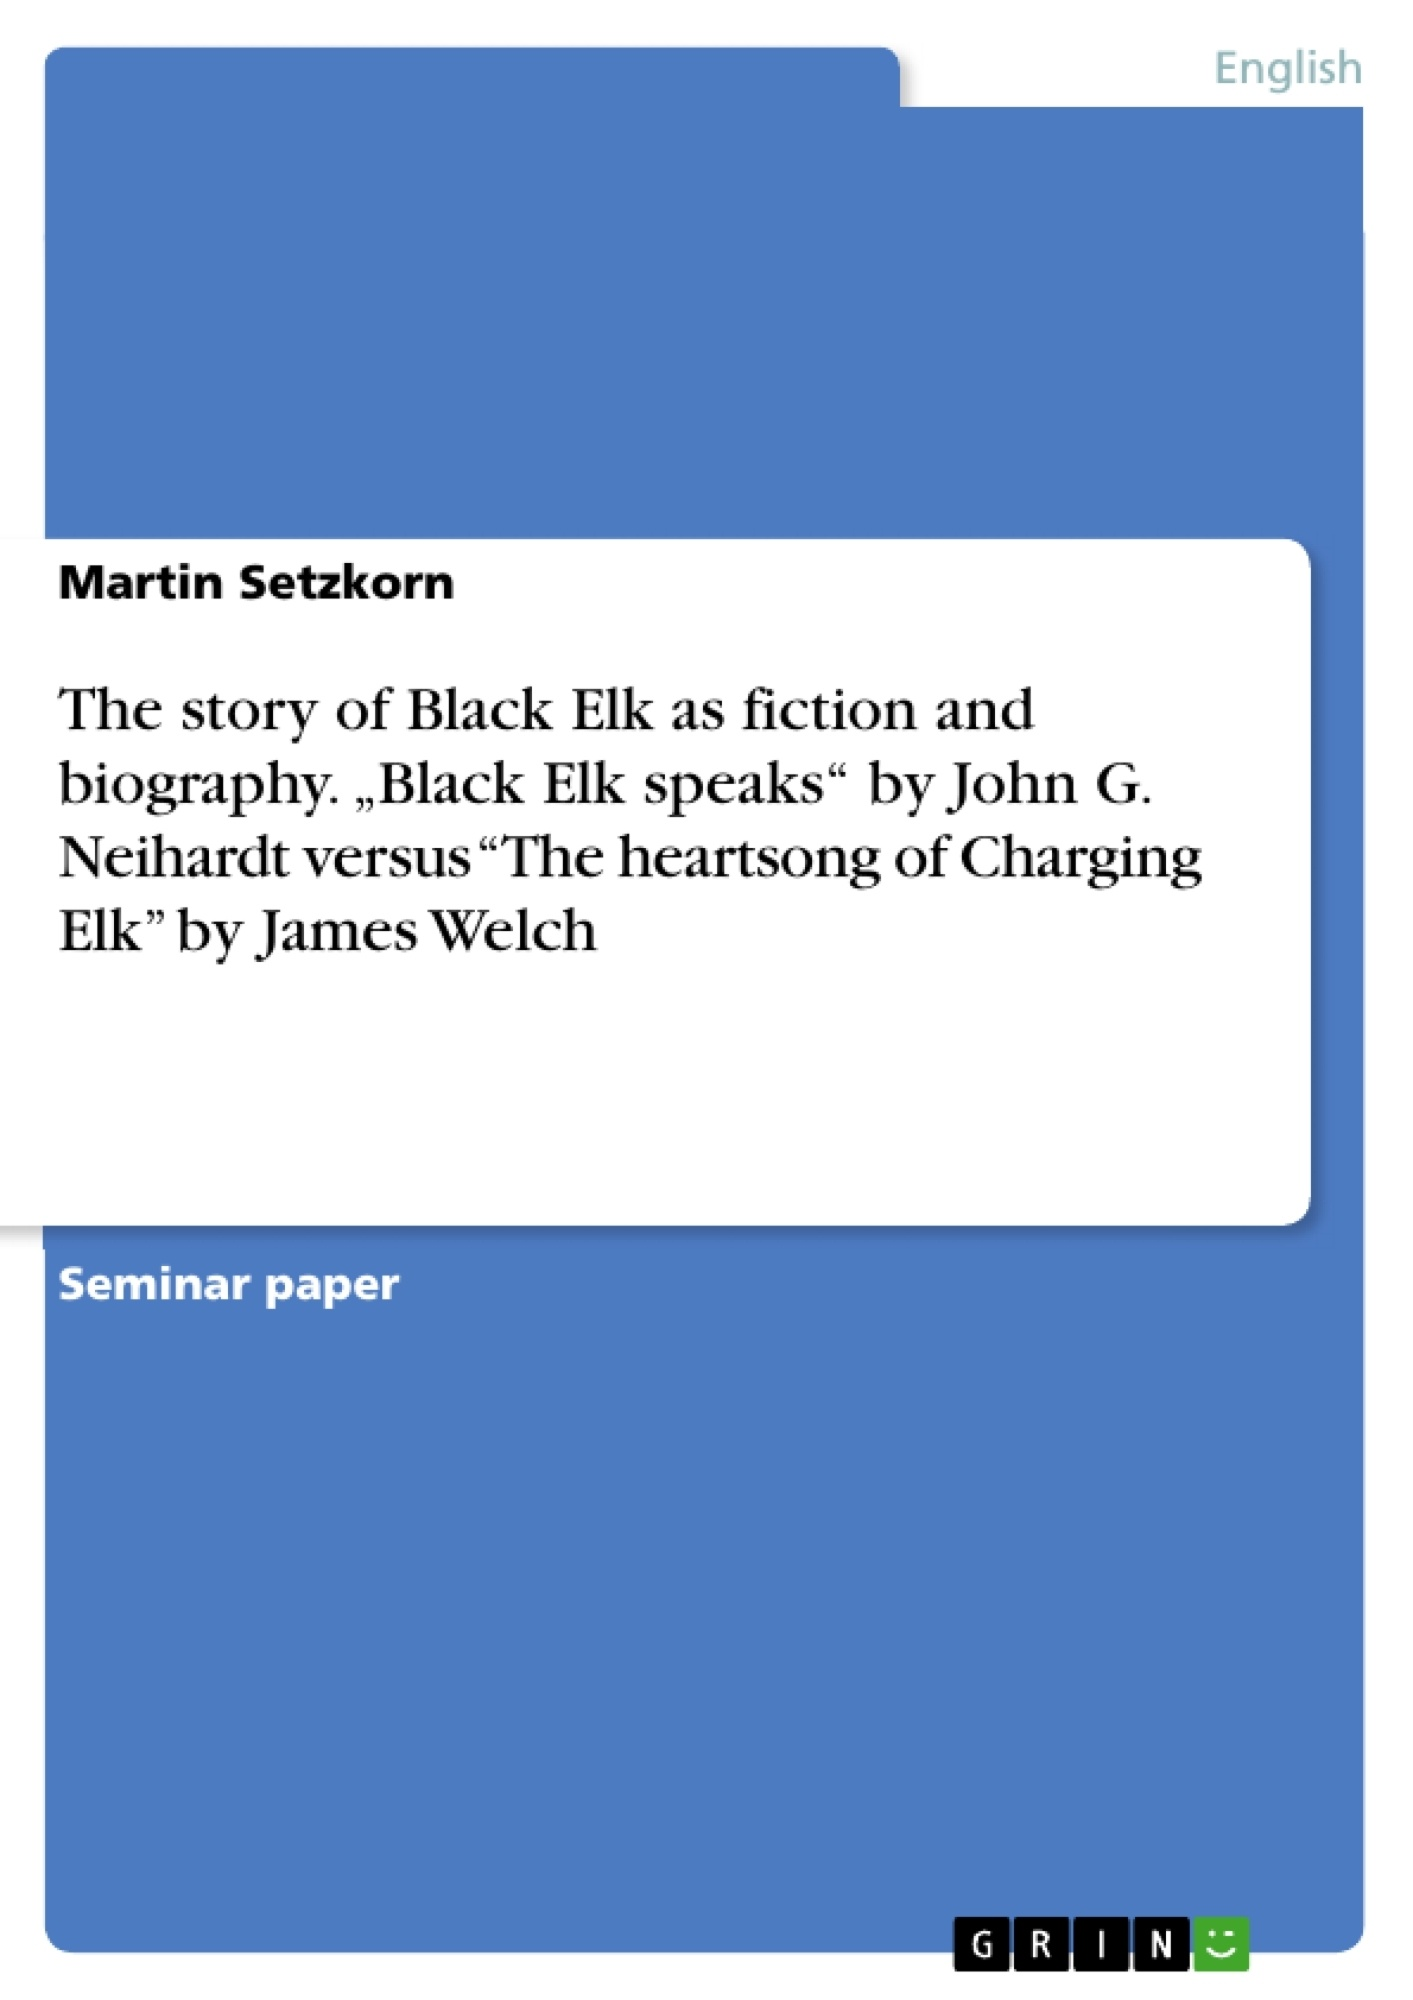 "Title: The story of Black Elk as fiction and biography. ""Black Elk speaks"" by John G. Neihardt versus ""The heartsong of Charging Elk"" by James Welch"